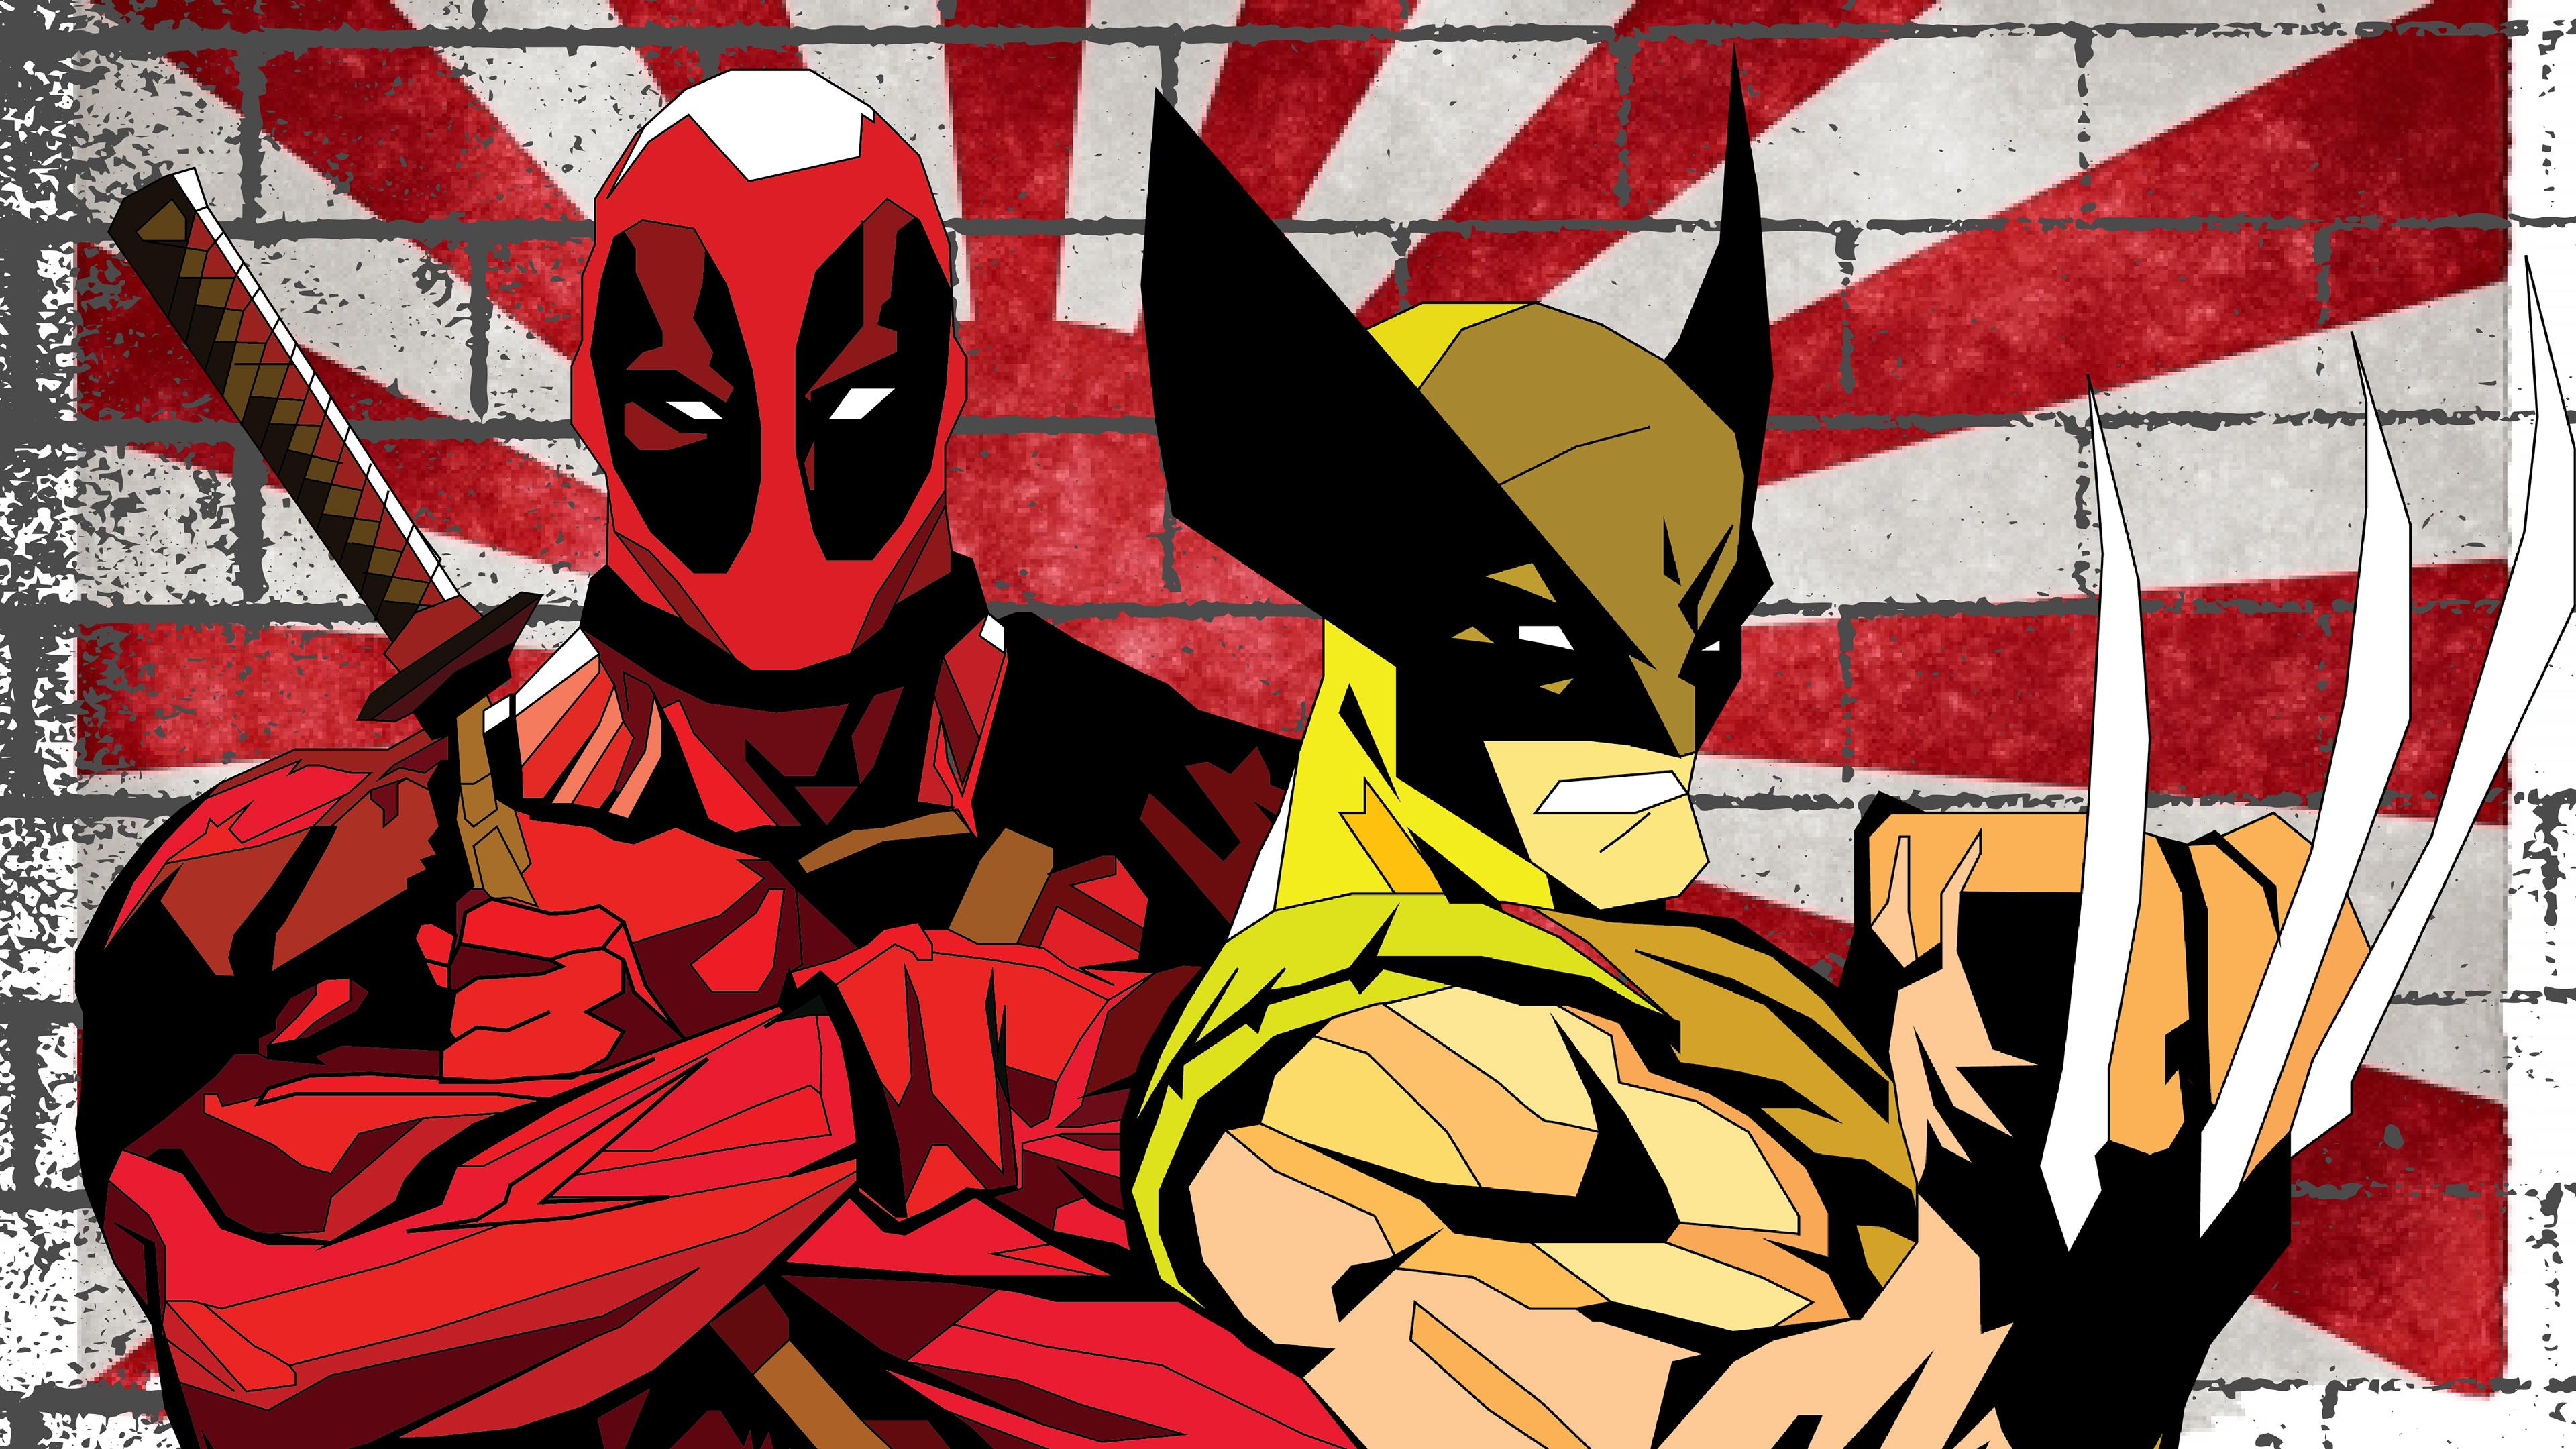 wolverine and deadpool vacation in japan 1543620139 - Wolverine And Deadpool Vacation In Japan - wolverine wallpapers, superheroes wallpapers, hd-wallpapers, deadpool wallpapers, behance wallpapers, artwork wallpapers, 4k-wallpapers